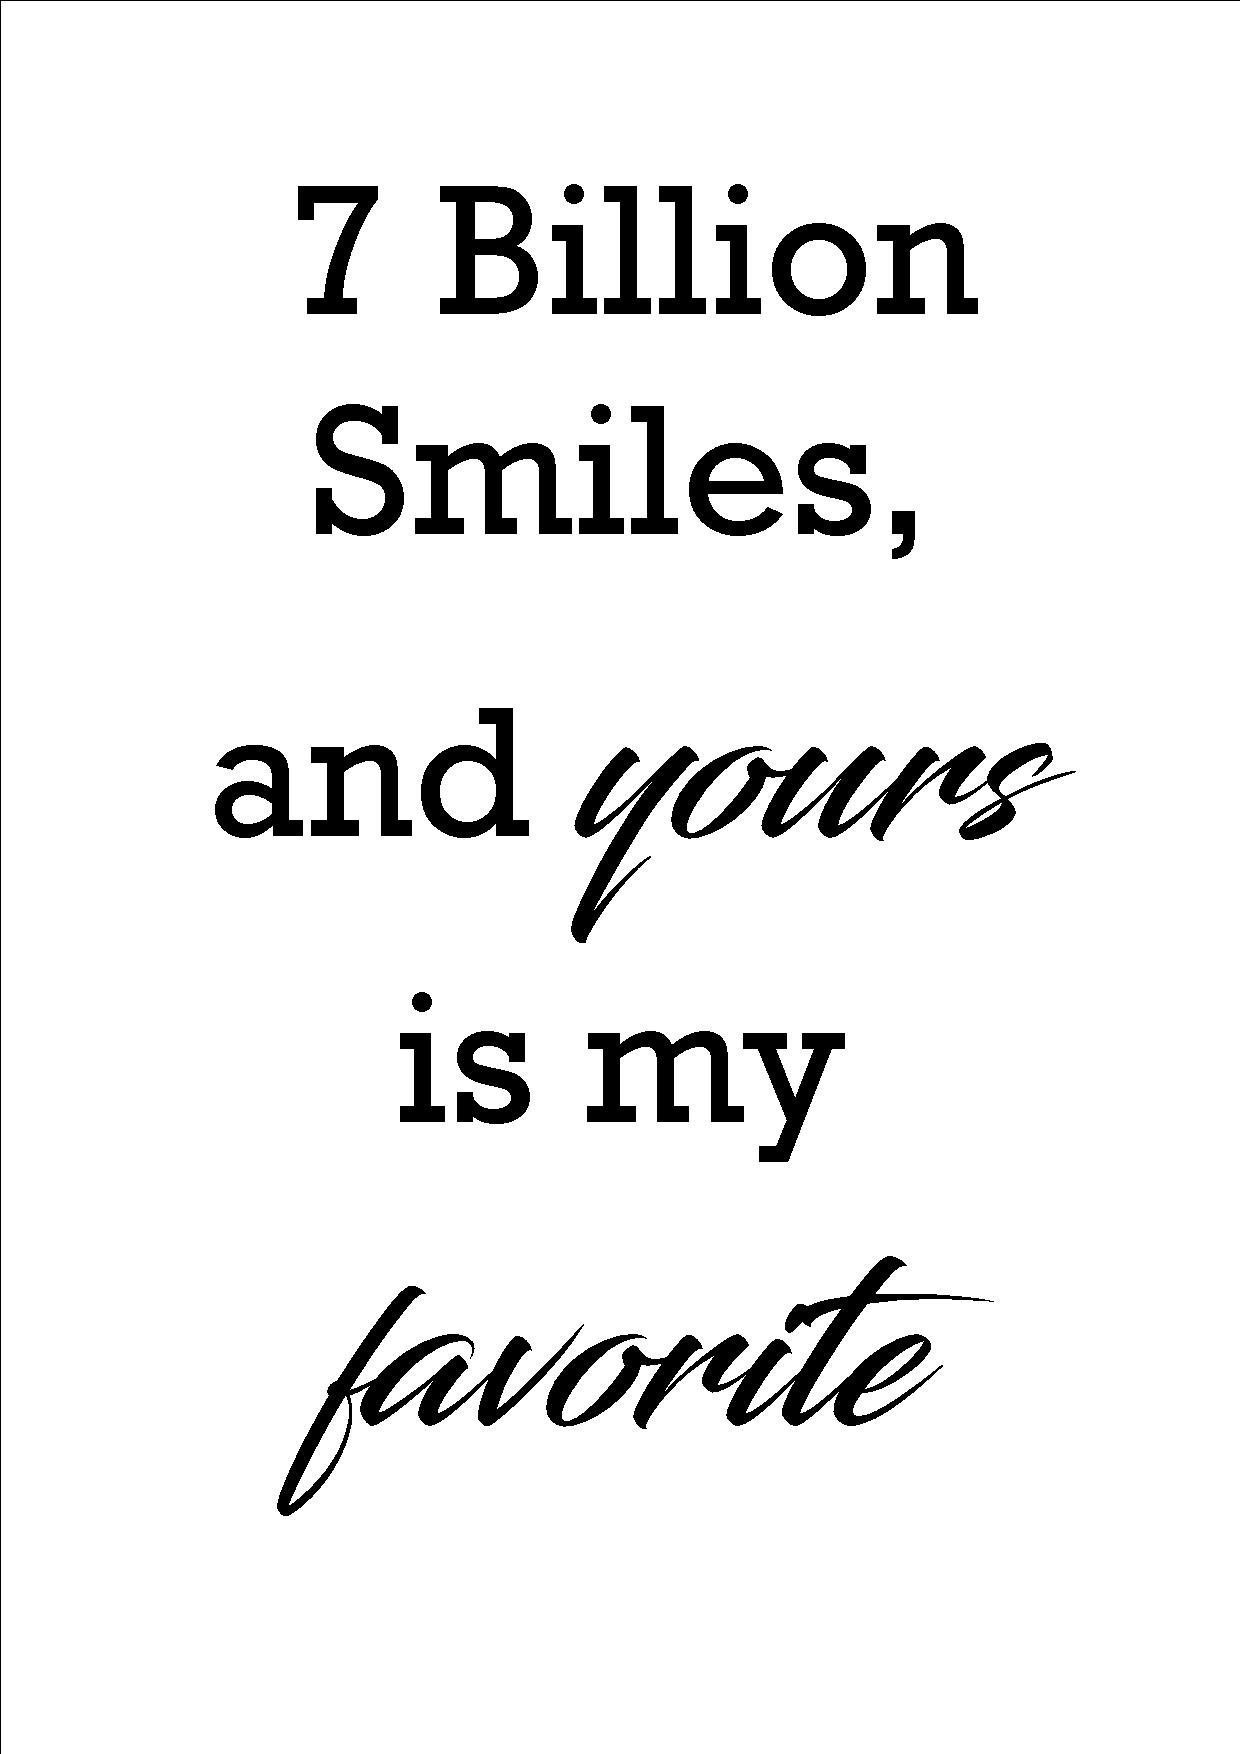 7 billion smiles